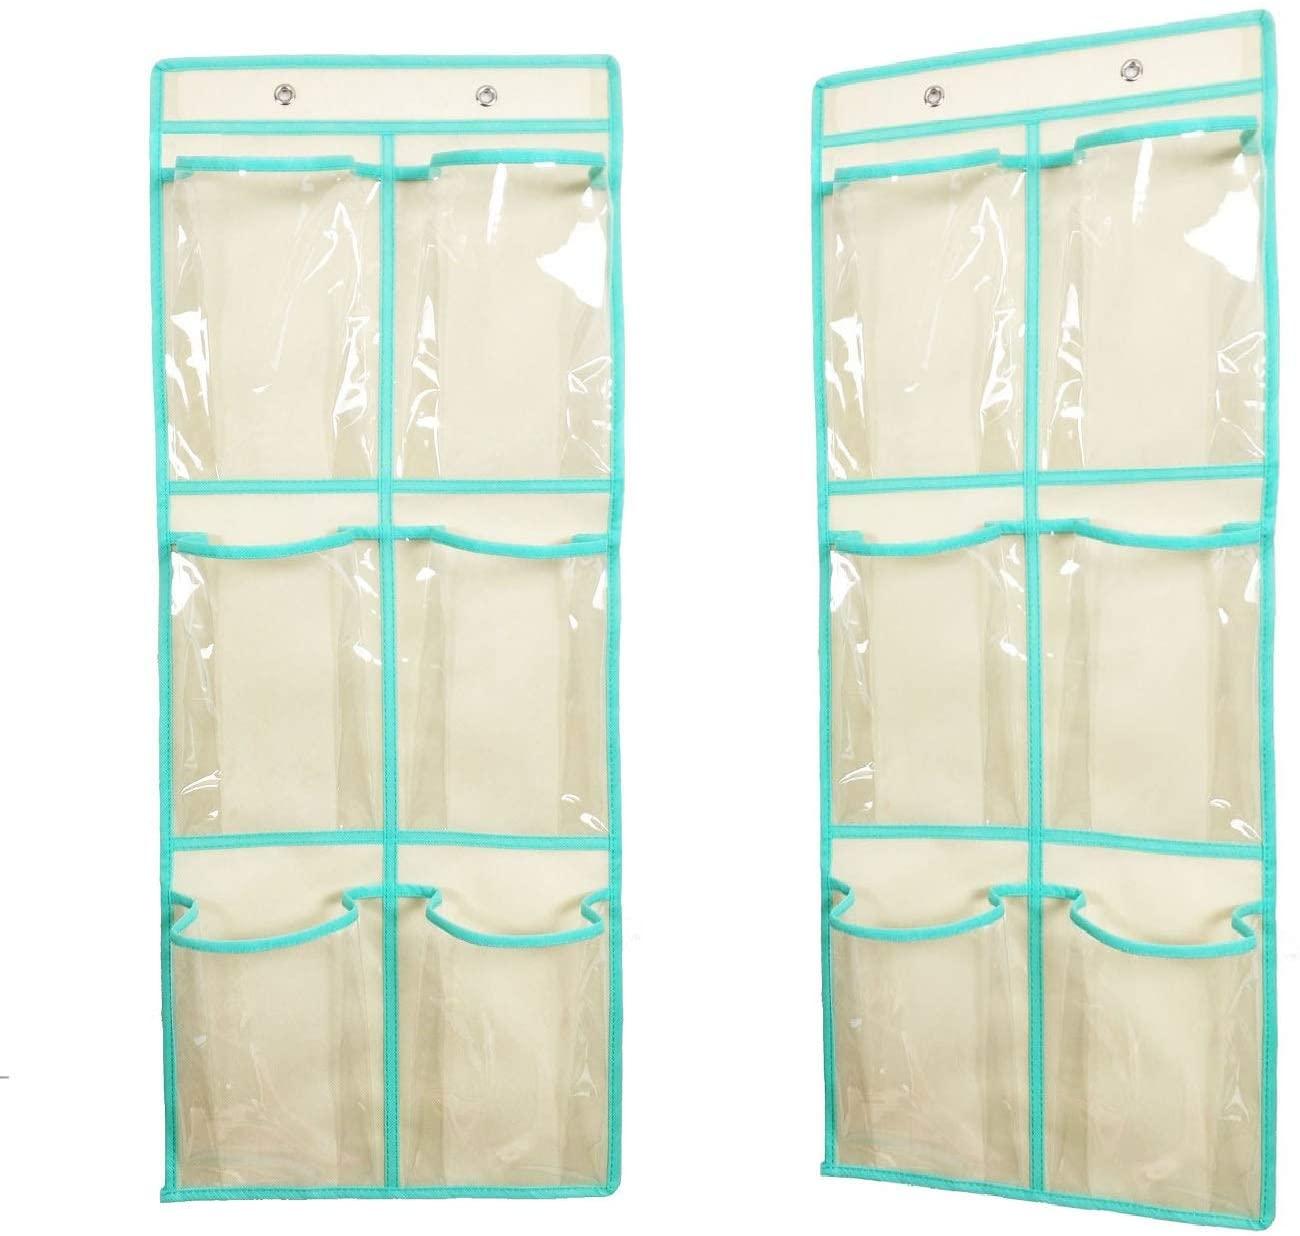 ANIZER Over The Door Hanging Shoe Organizer Narrow Closet Door Shoe Storage 6 Large Clear Pockets Chart 2 Pack (BEIGE)